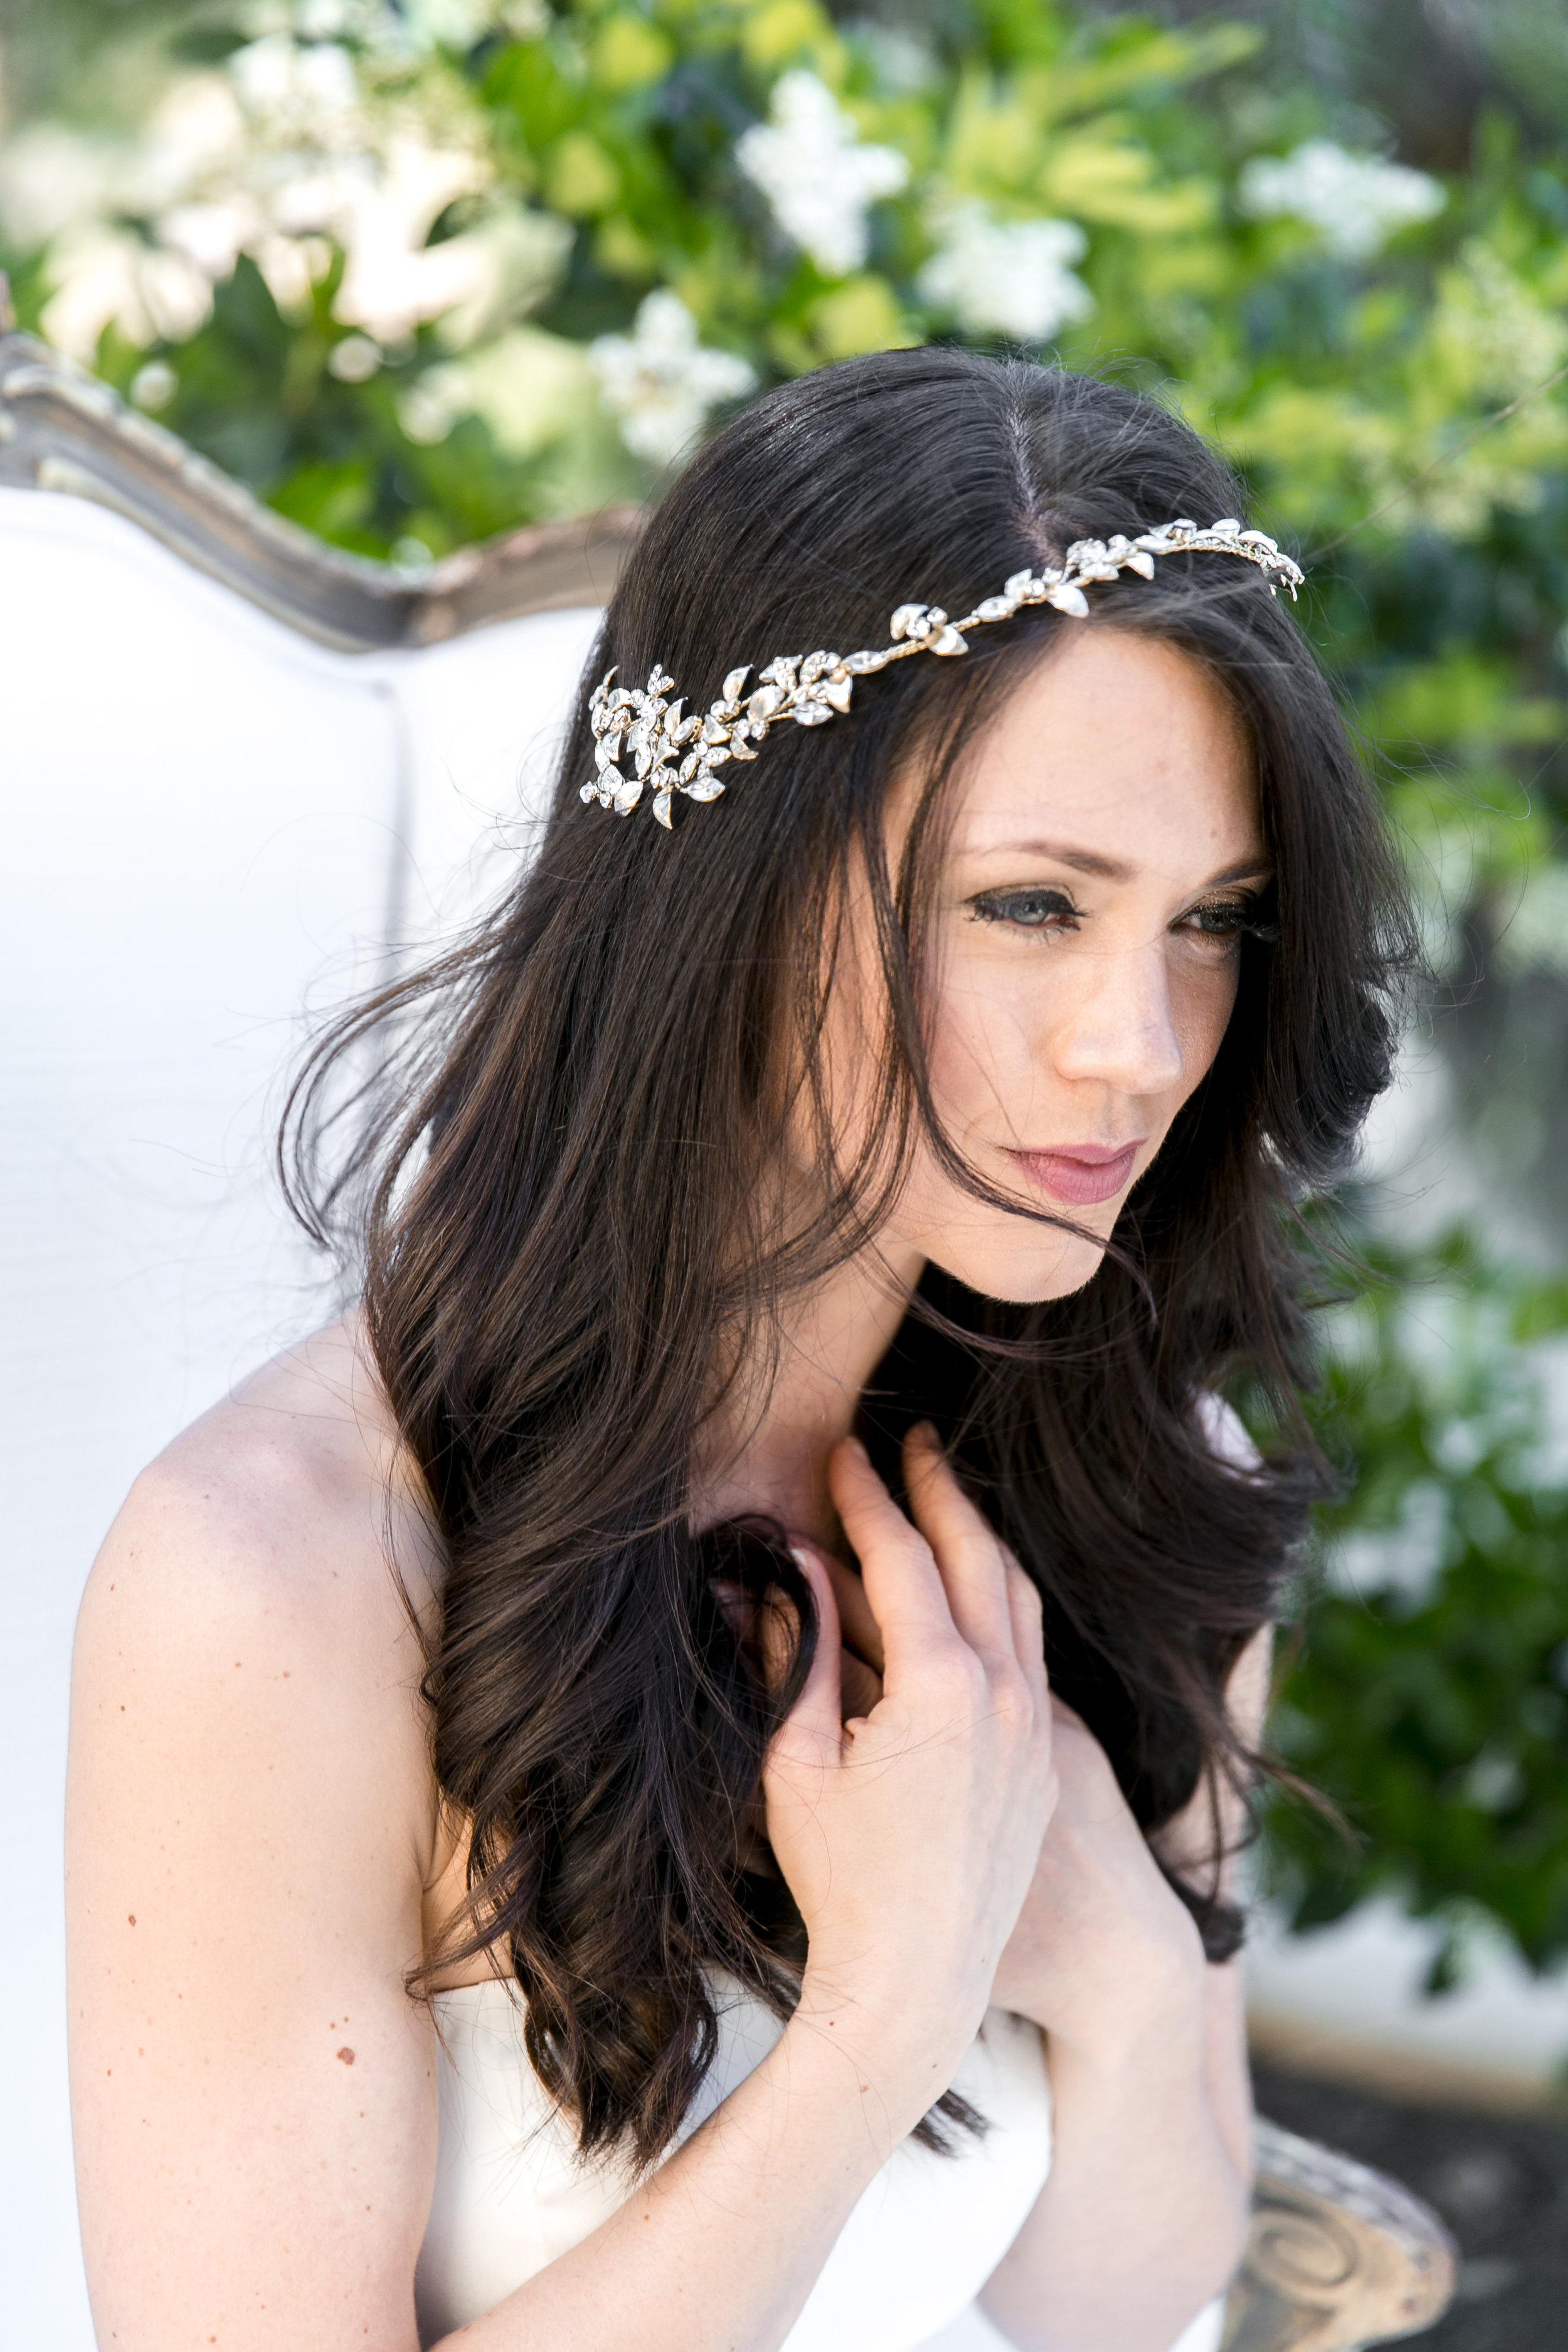 Danza Del Sol Winery | San Diego Weddings | Temecula Weddings | Temecula Wedding Hair Artist| Temecula Wedding Makeup Artist | Weddings